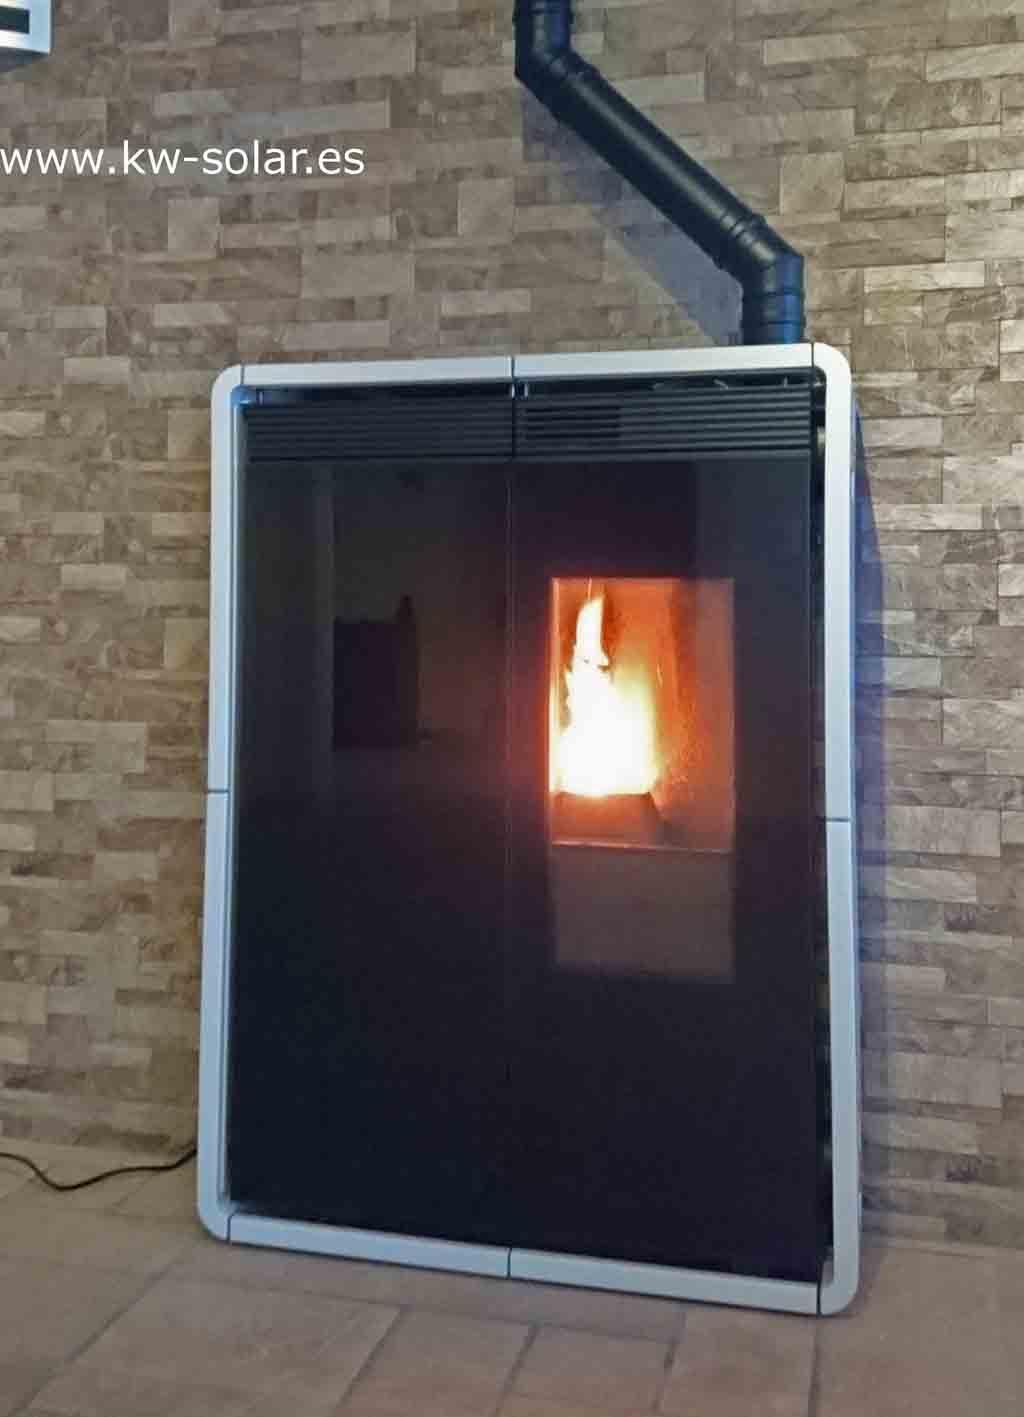 Pellet Stove 8 Kw Black Edilkamin Fire Tiny 9